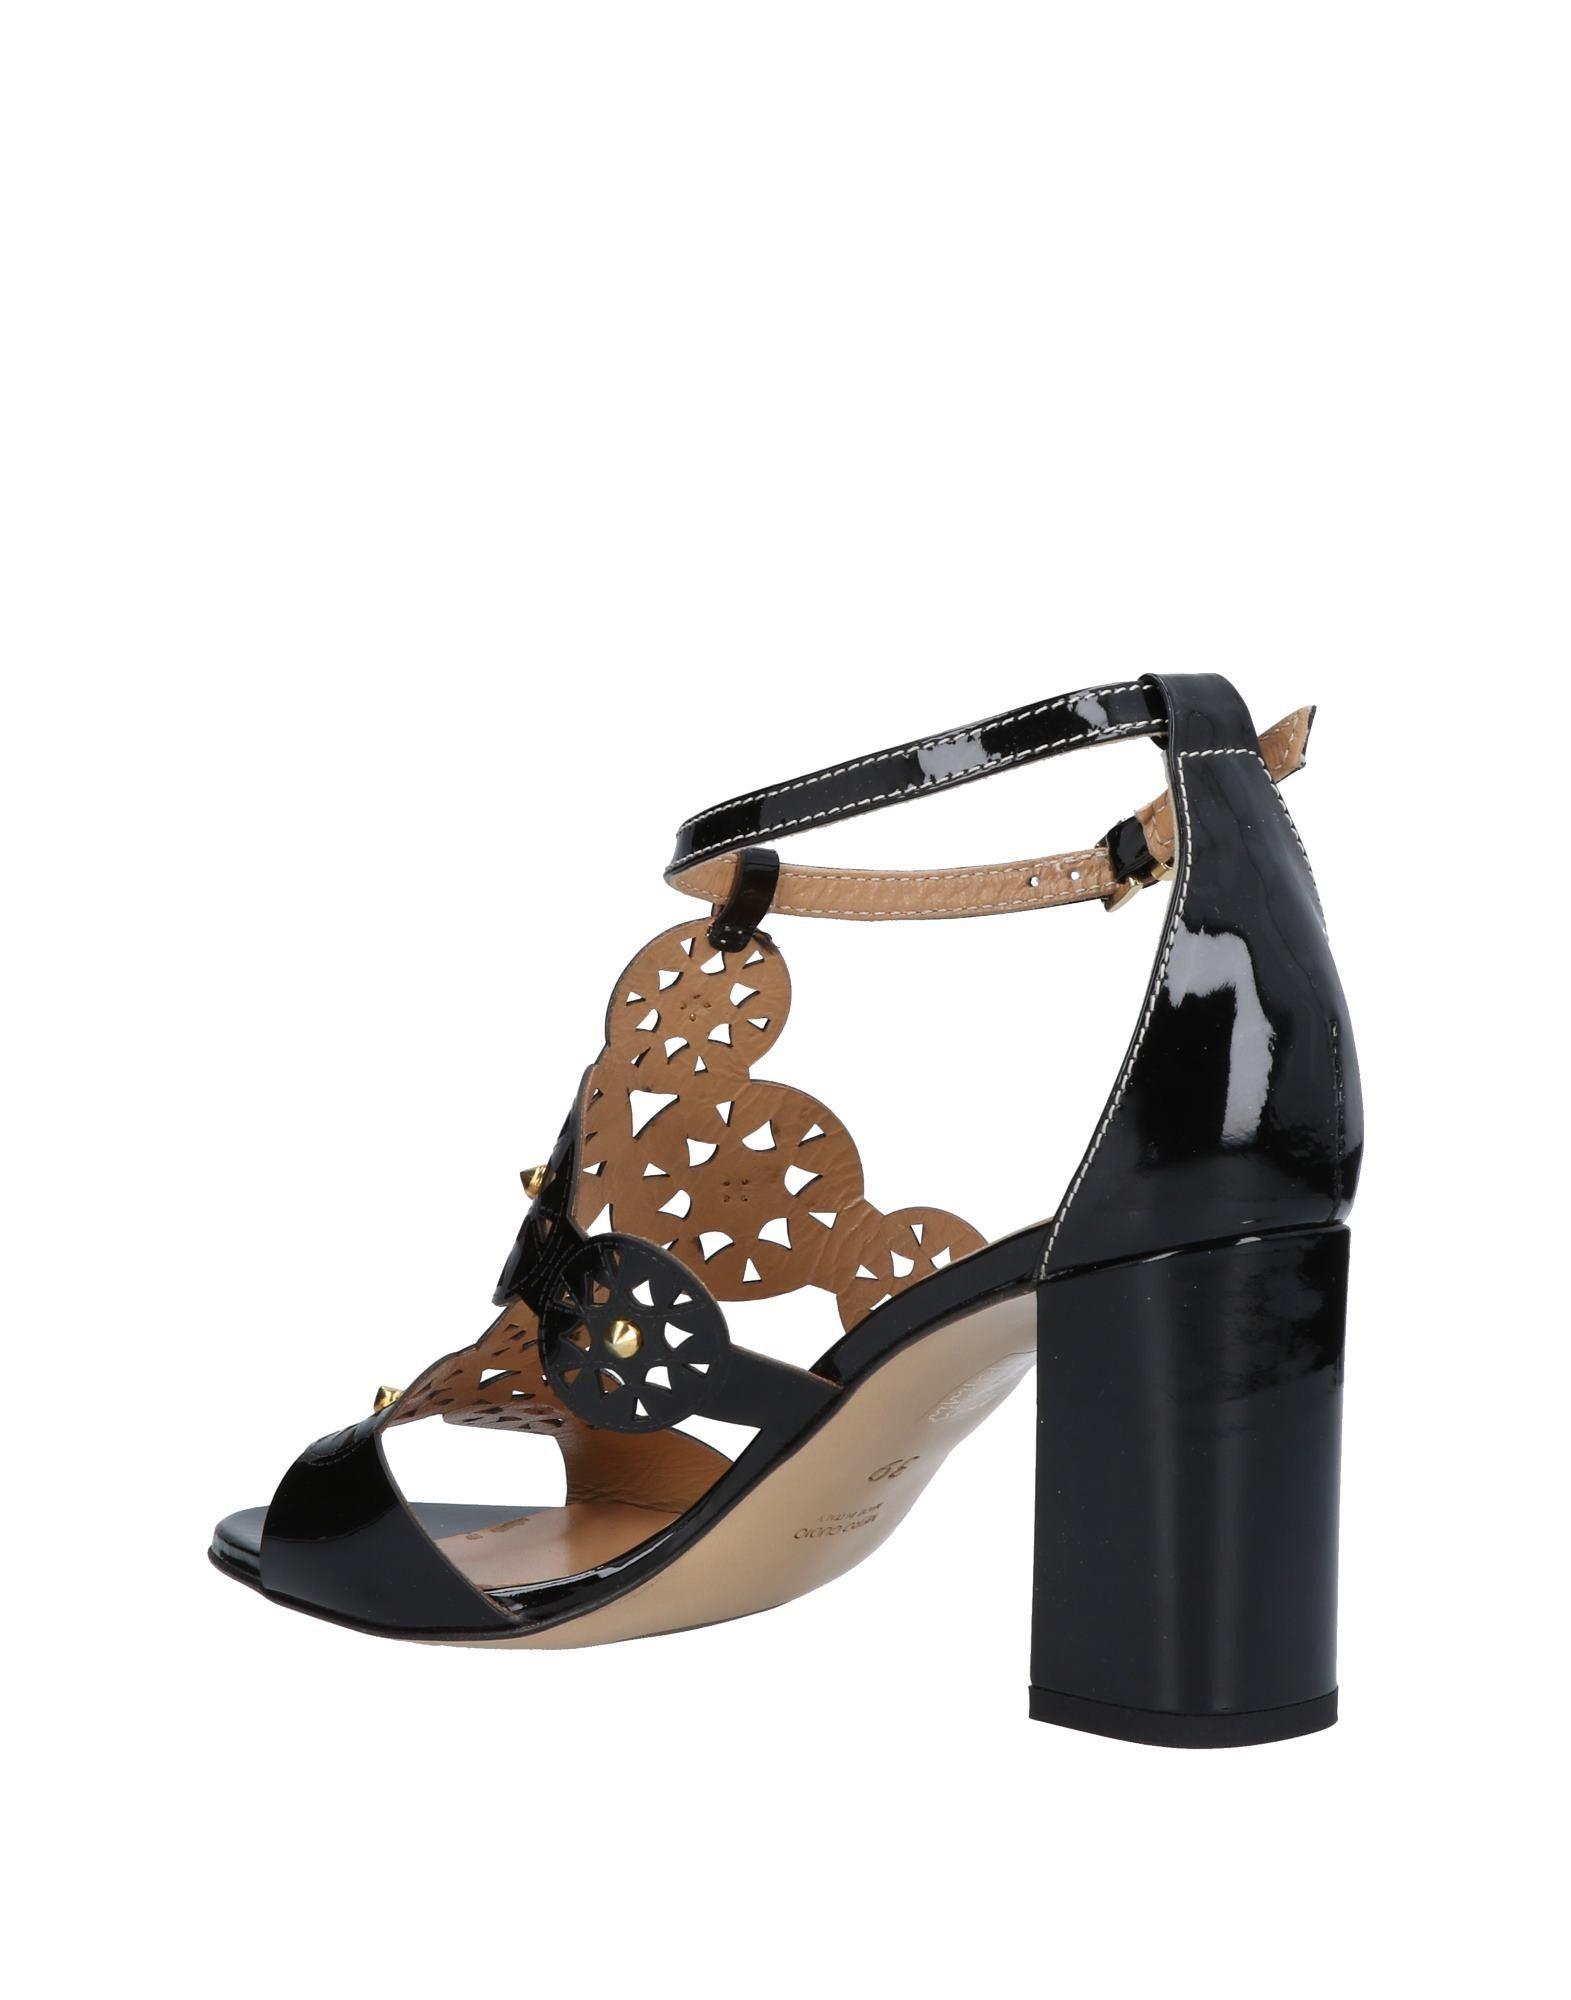 Napoleoni Sandalen Damen  11464735VC Gute Qualität beliebte Schuhe Schuhe Schuhe efcff8